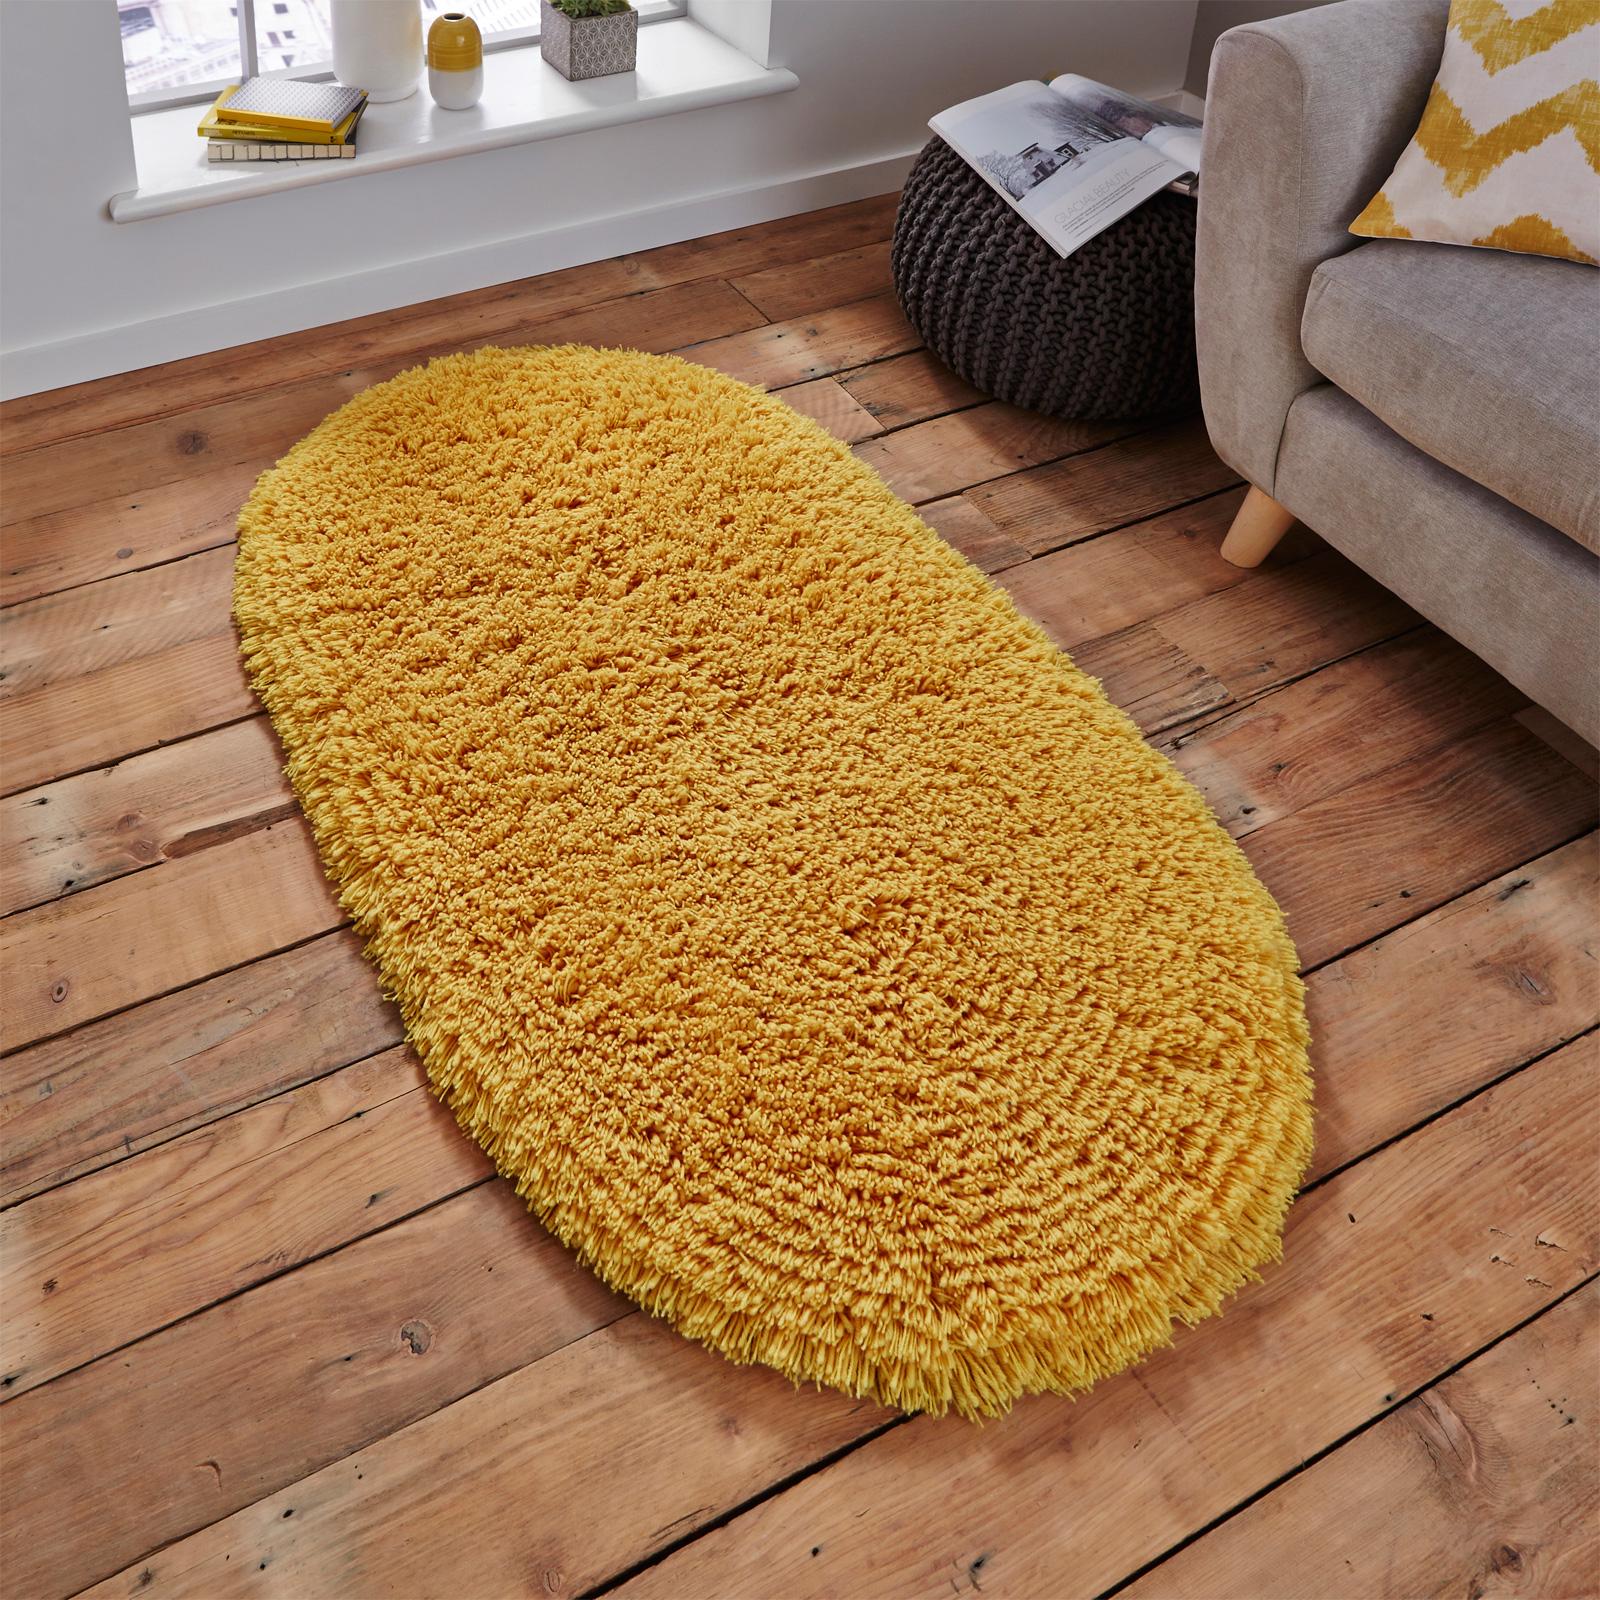 Oval Shaped Carpet Rug